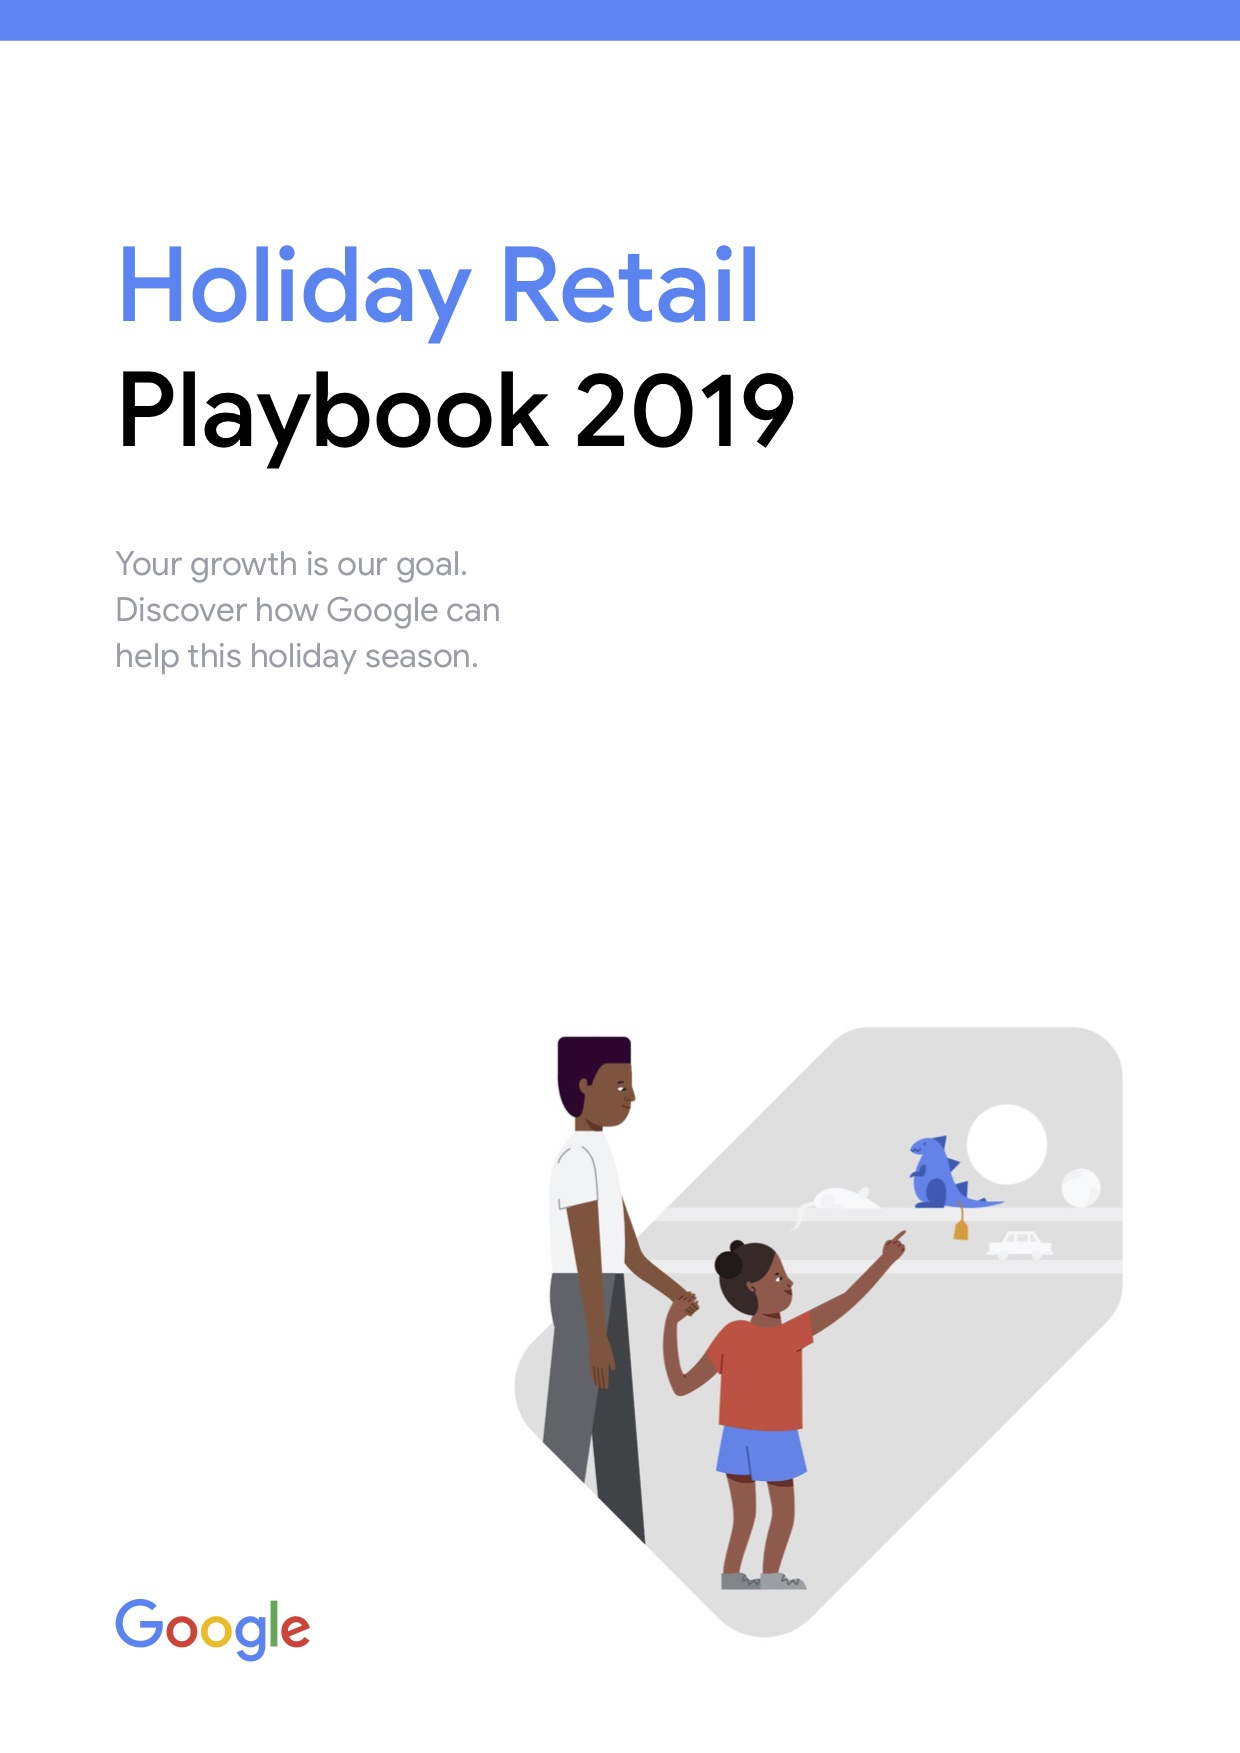 📘 Holiday Retail #Playbook 2019 - Google Ads Help